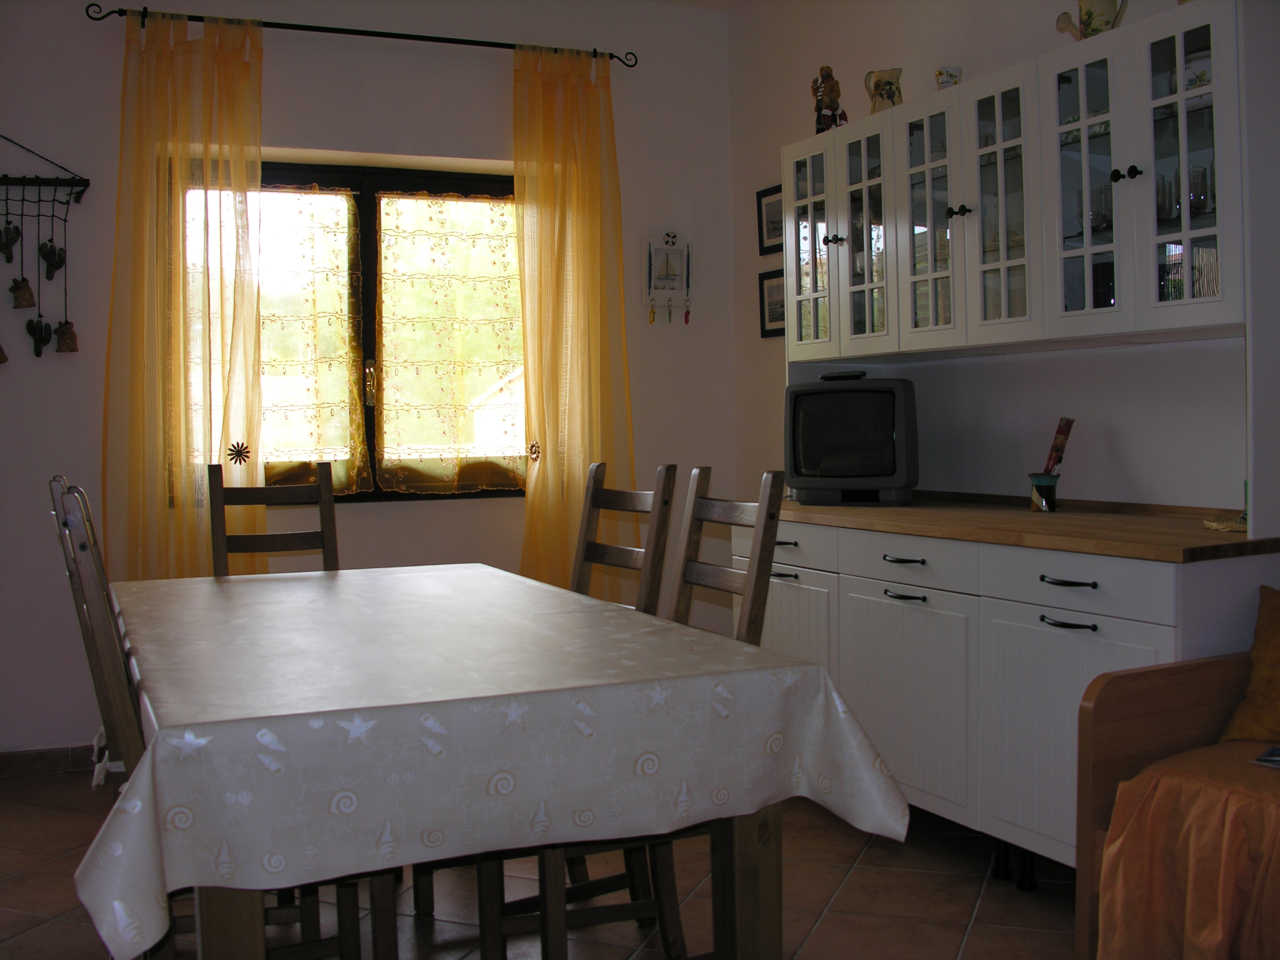 Affitto residence mare la maddalena